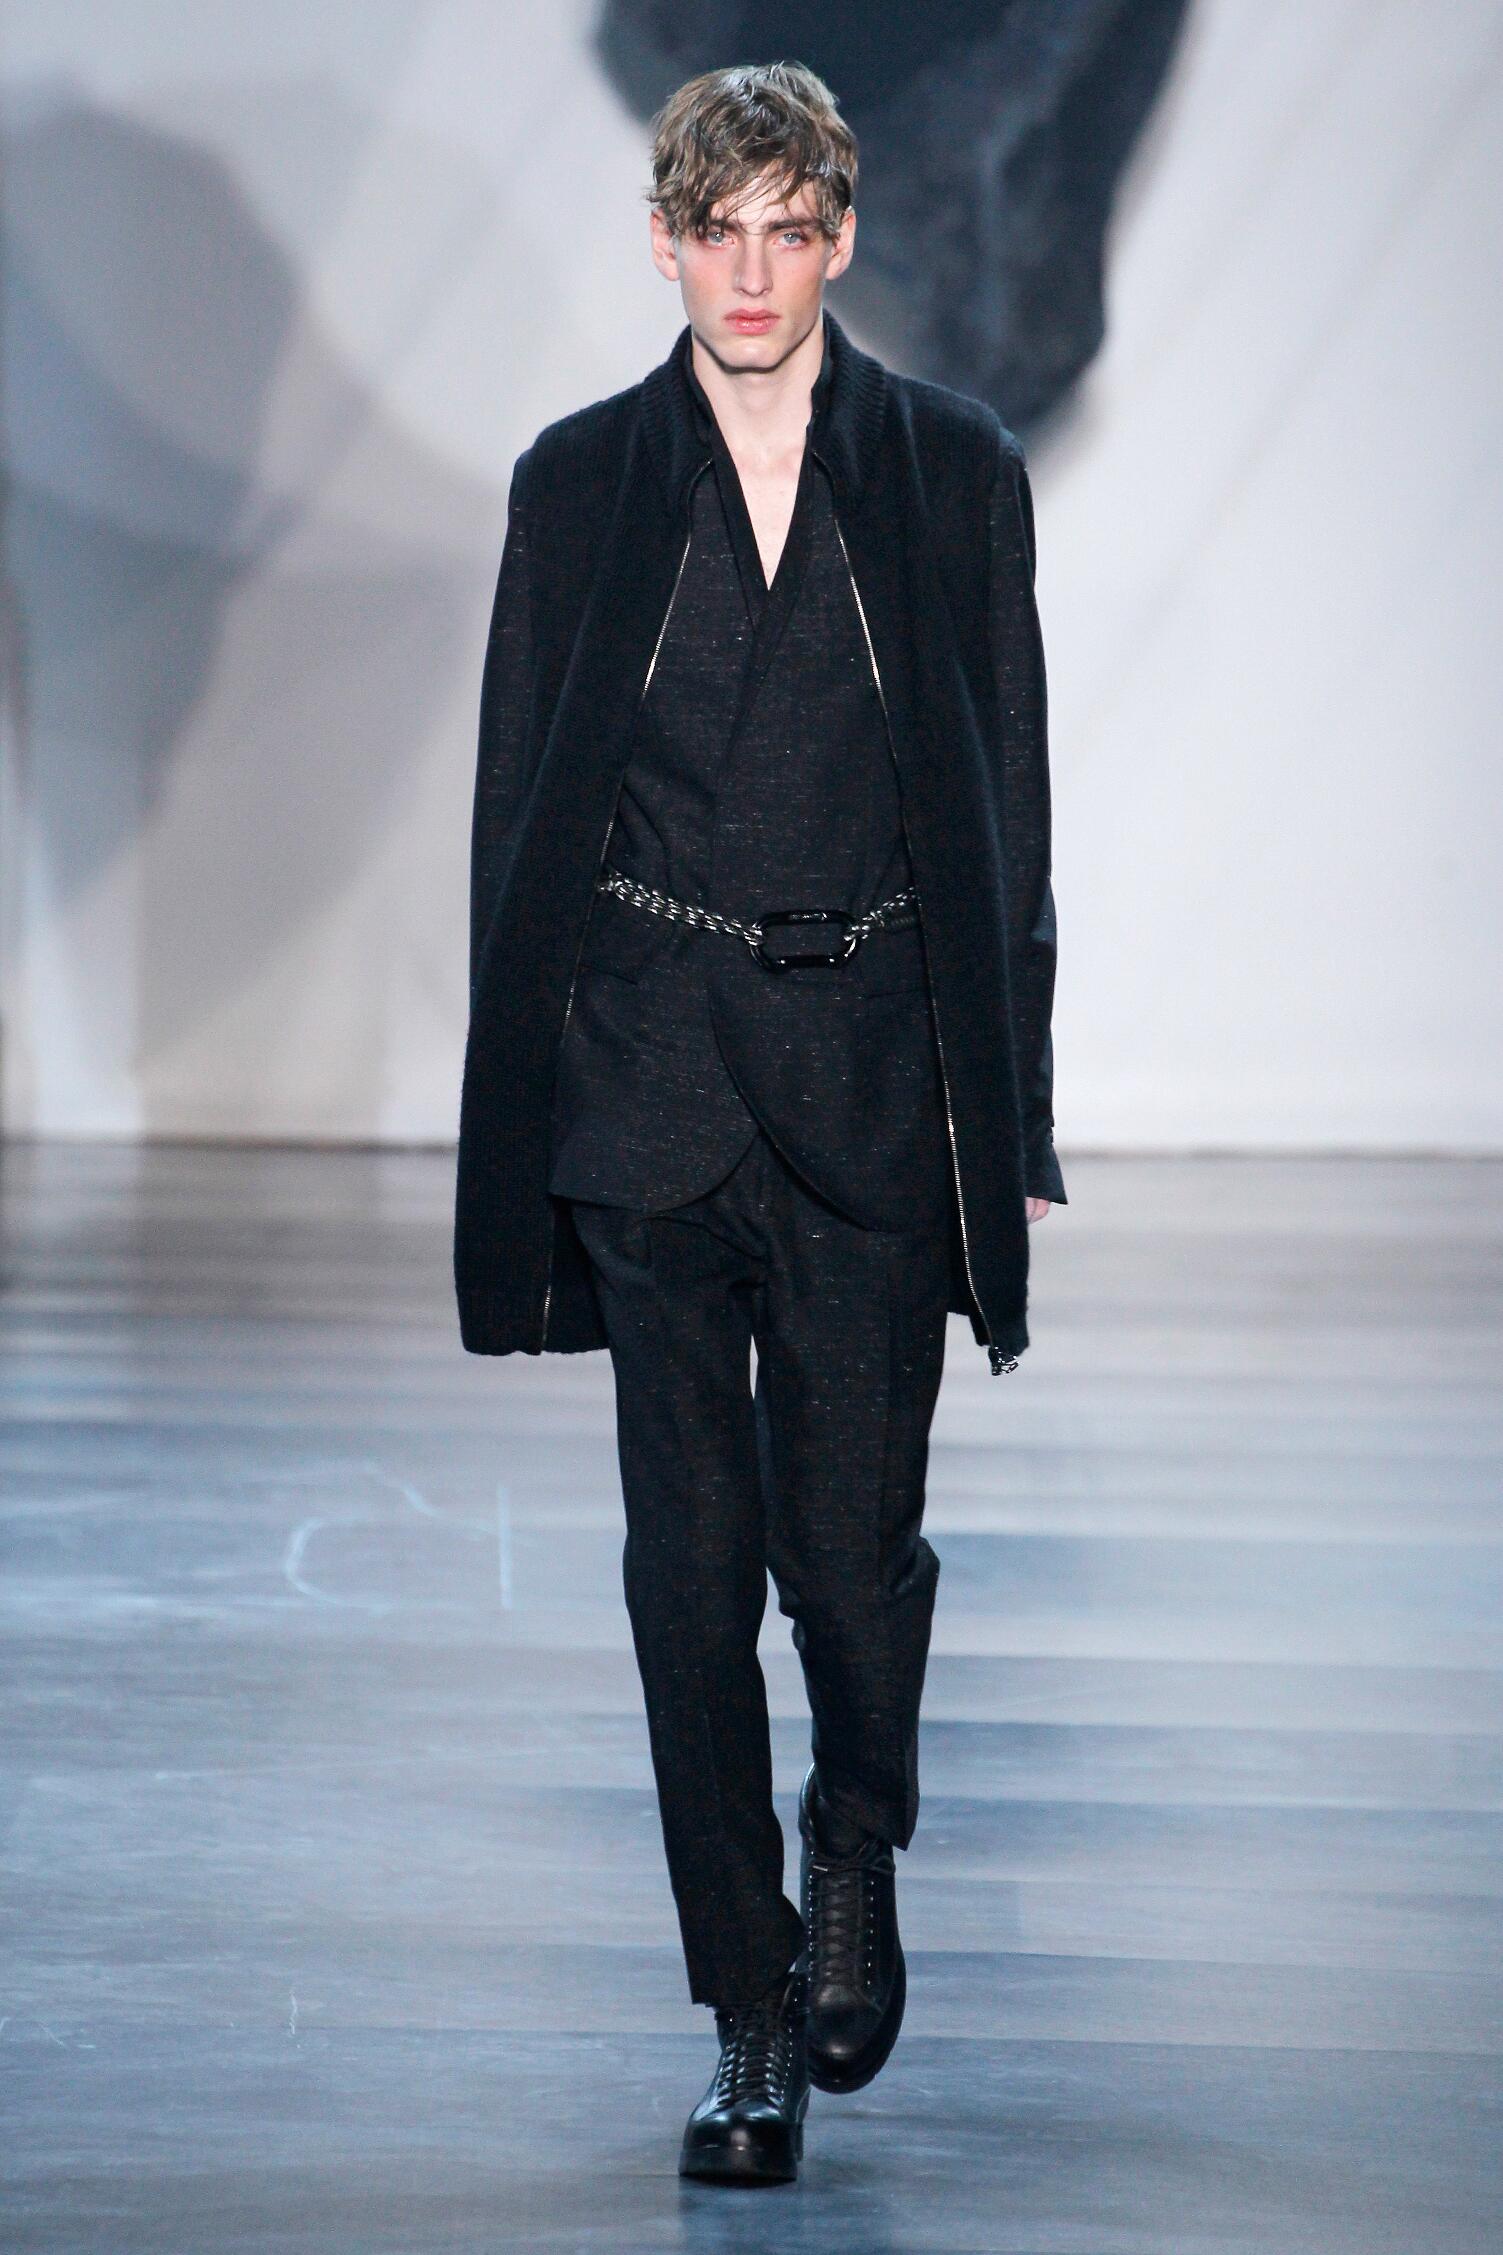 Fall Winter 2015 16 Fashion Collection 3.1 Phillip Lim